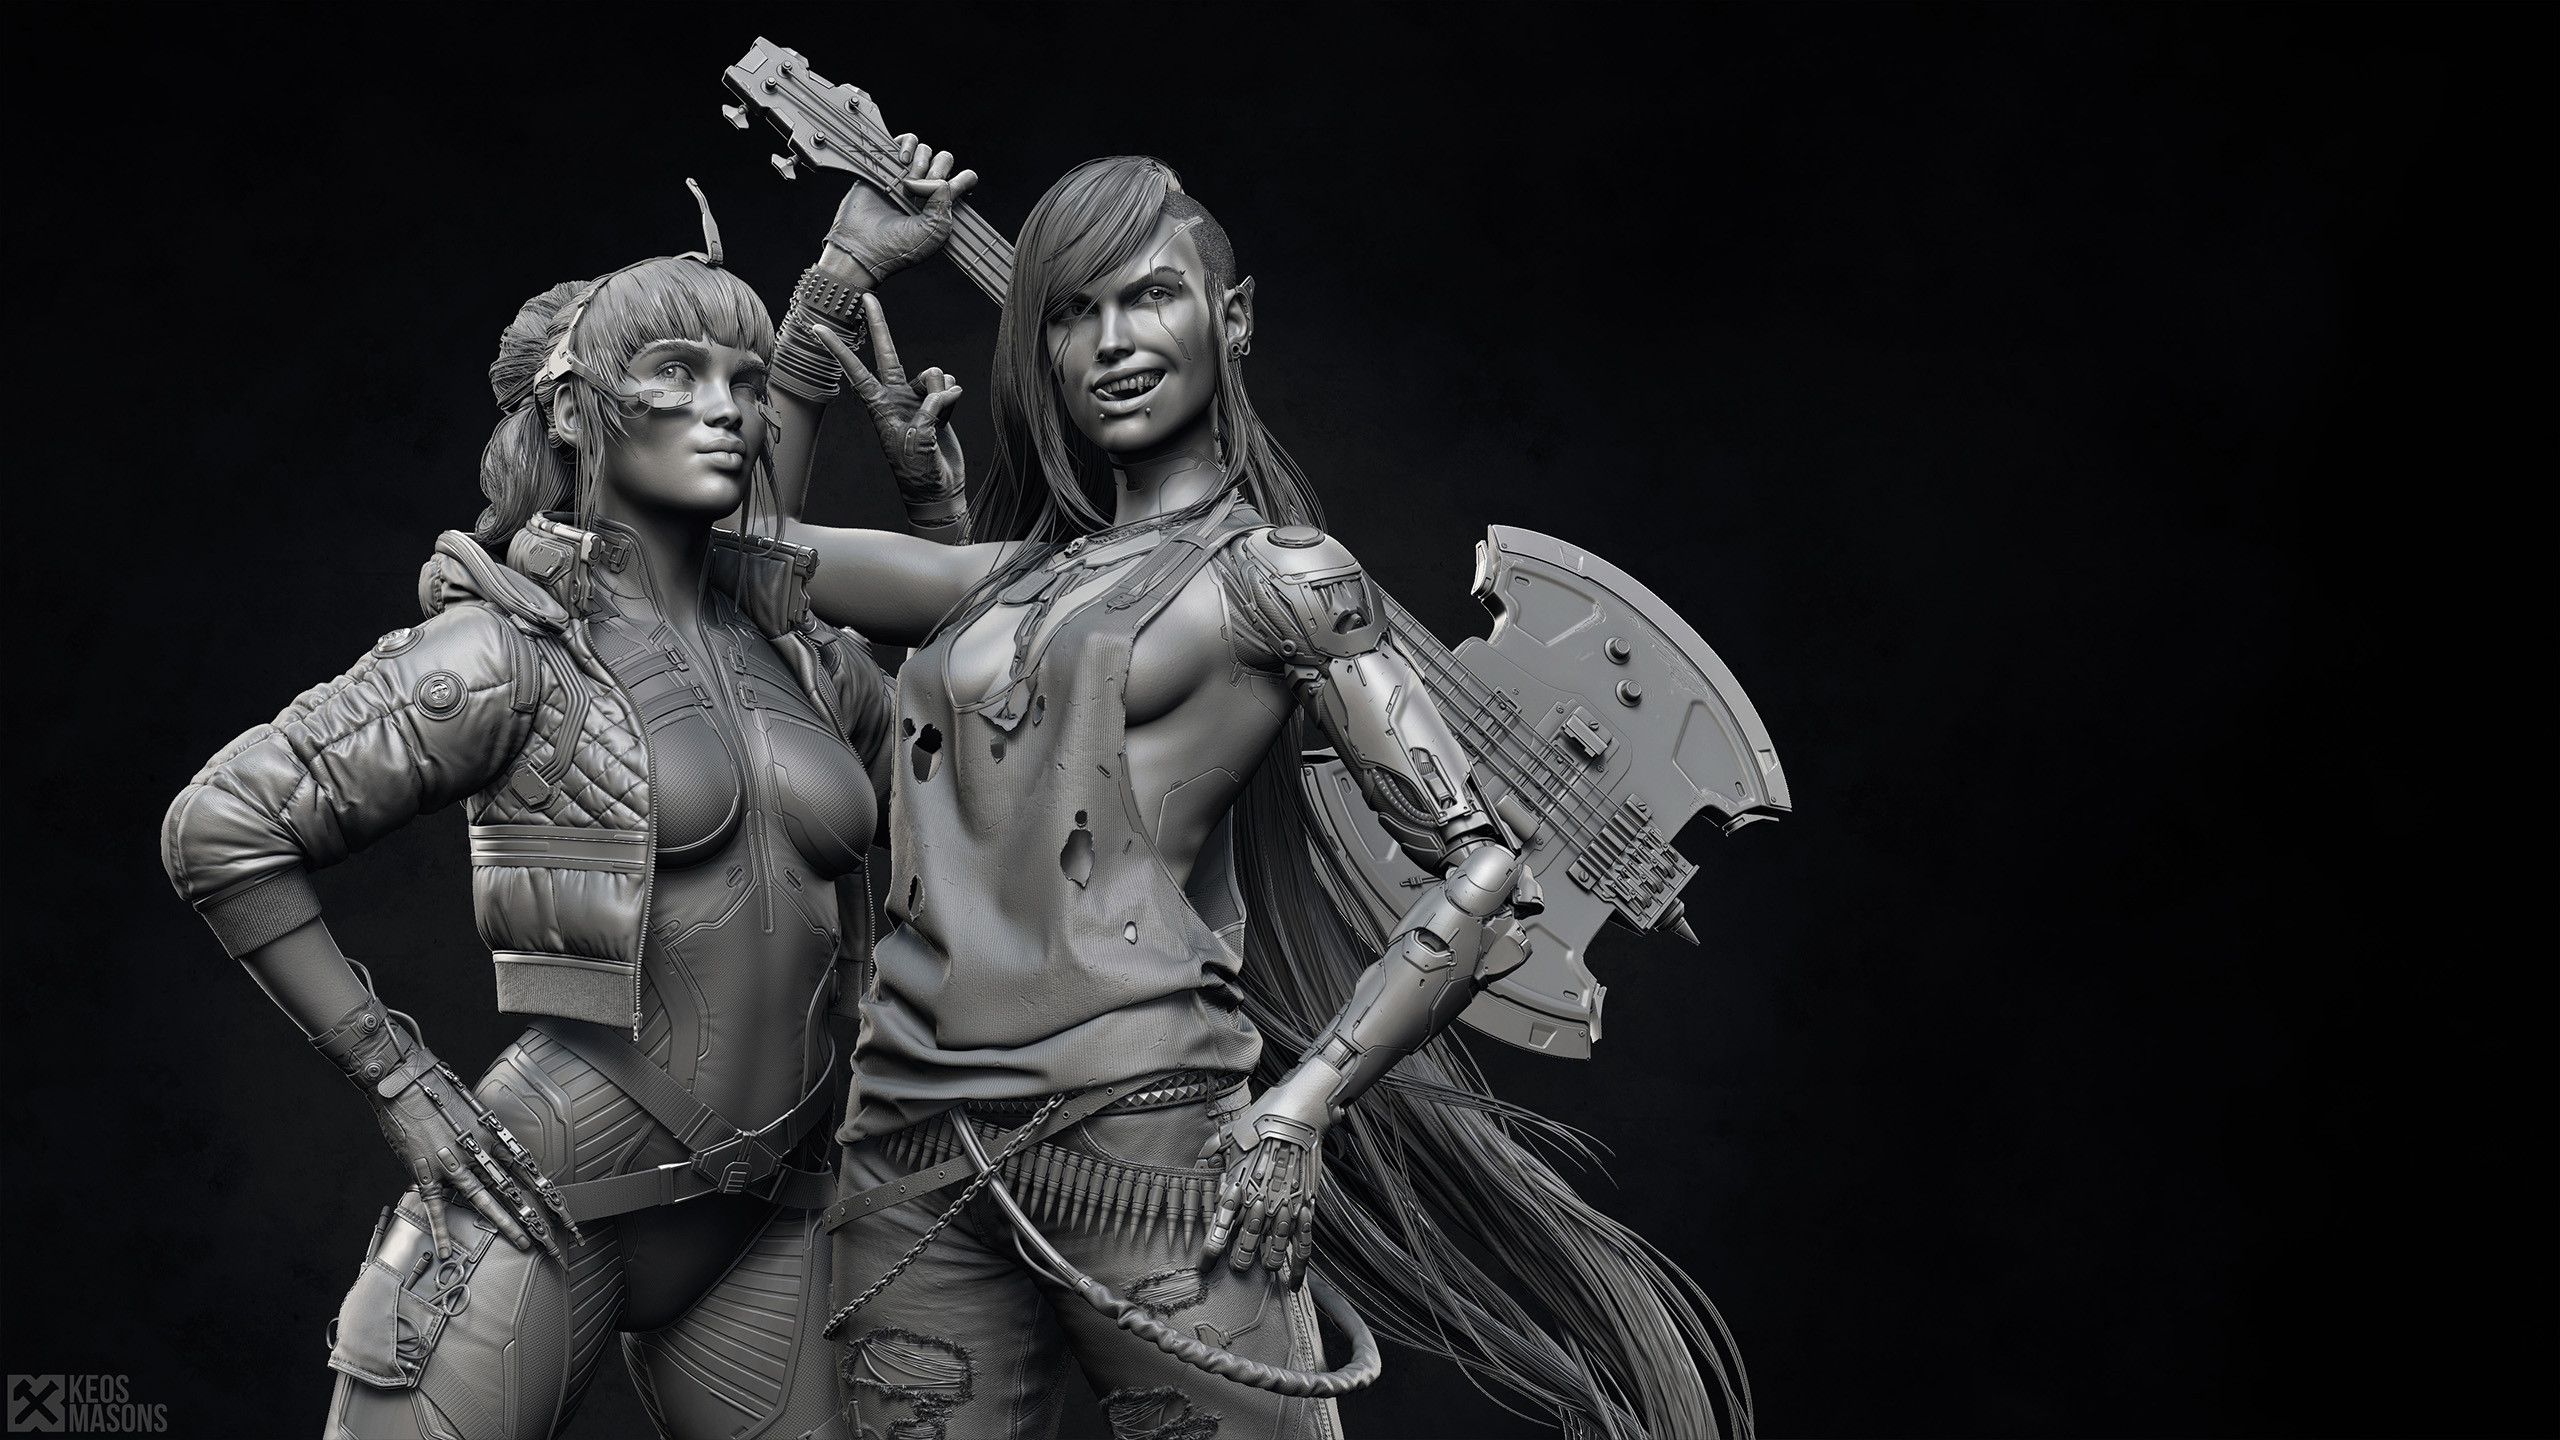 Hora de Aventura: Fanart transforma a la Dulce Princesa y a Marceline en personajes de Cyberpunk 2077